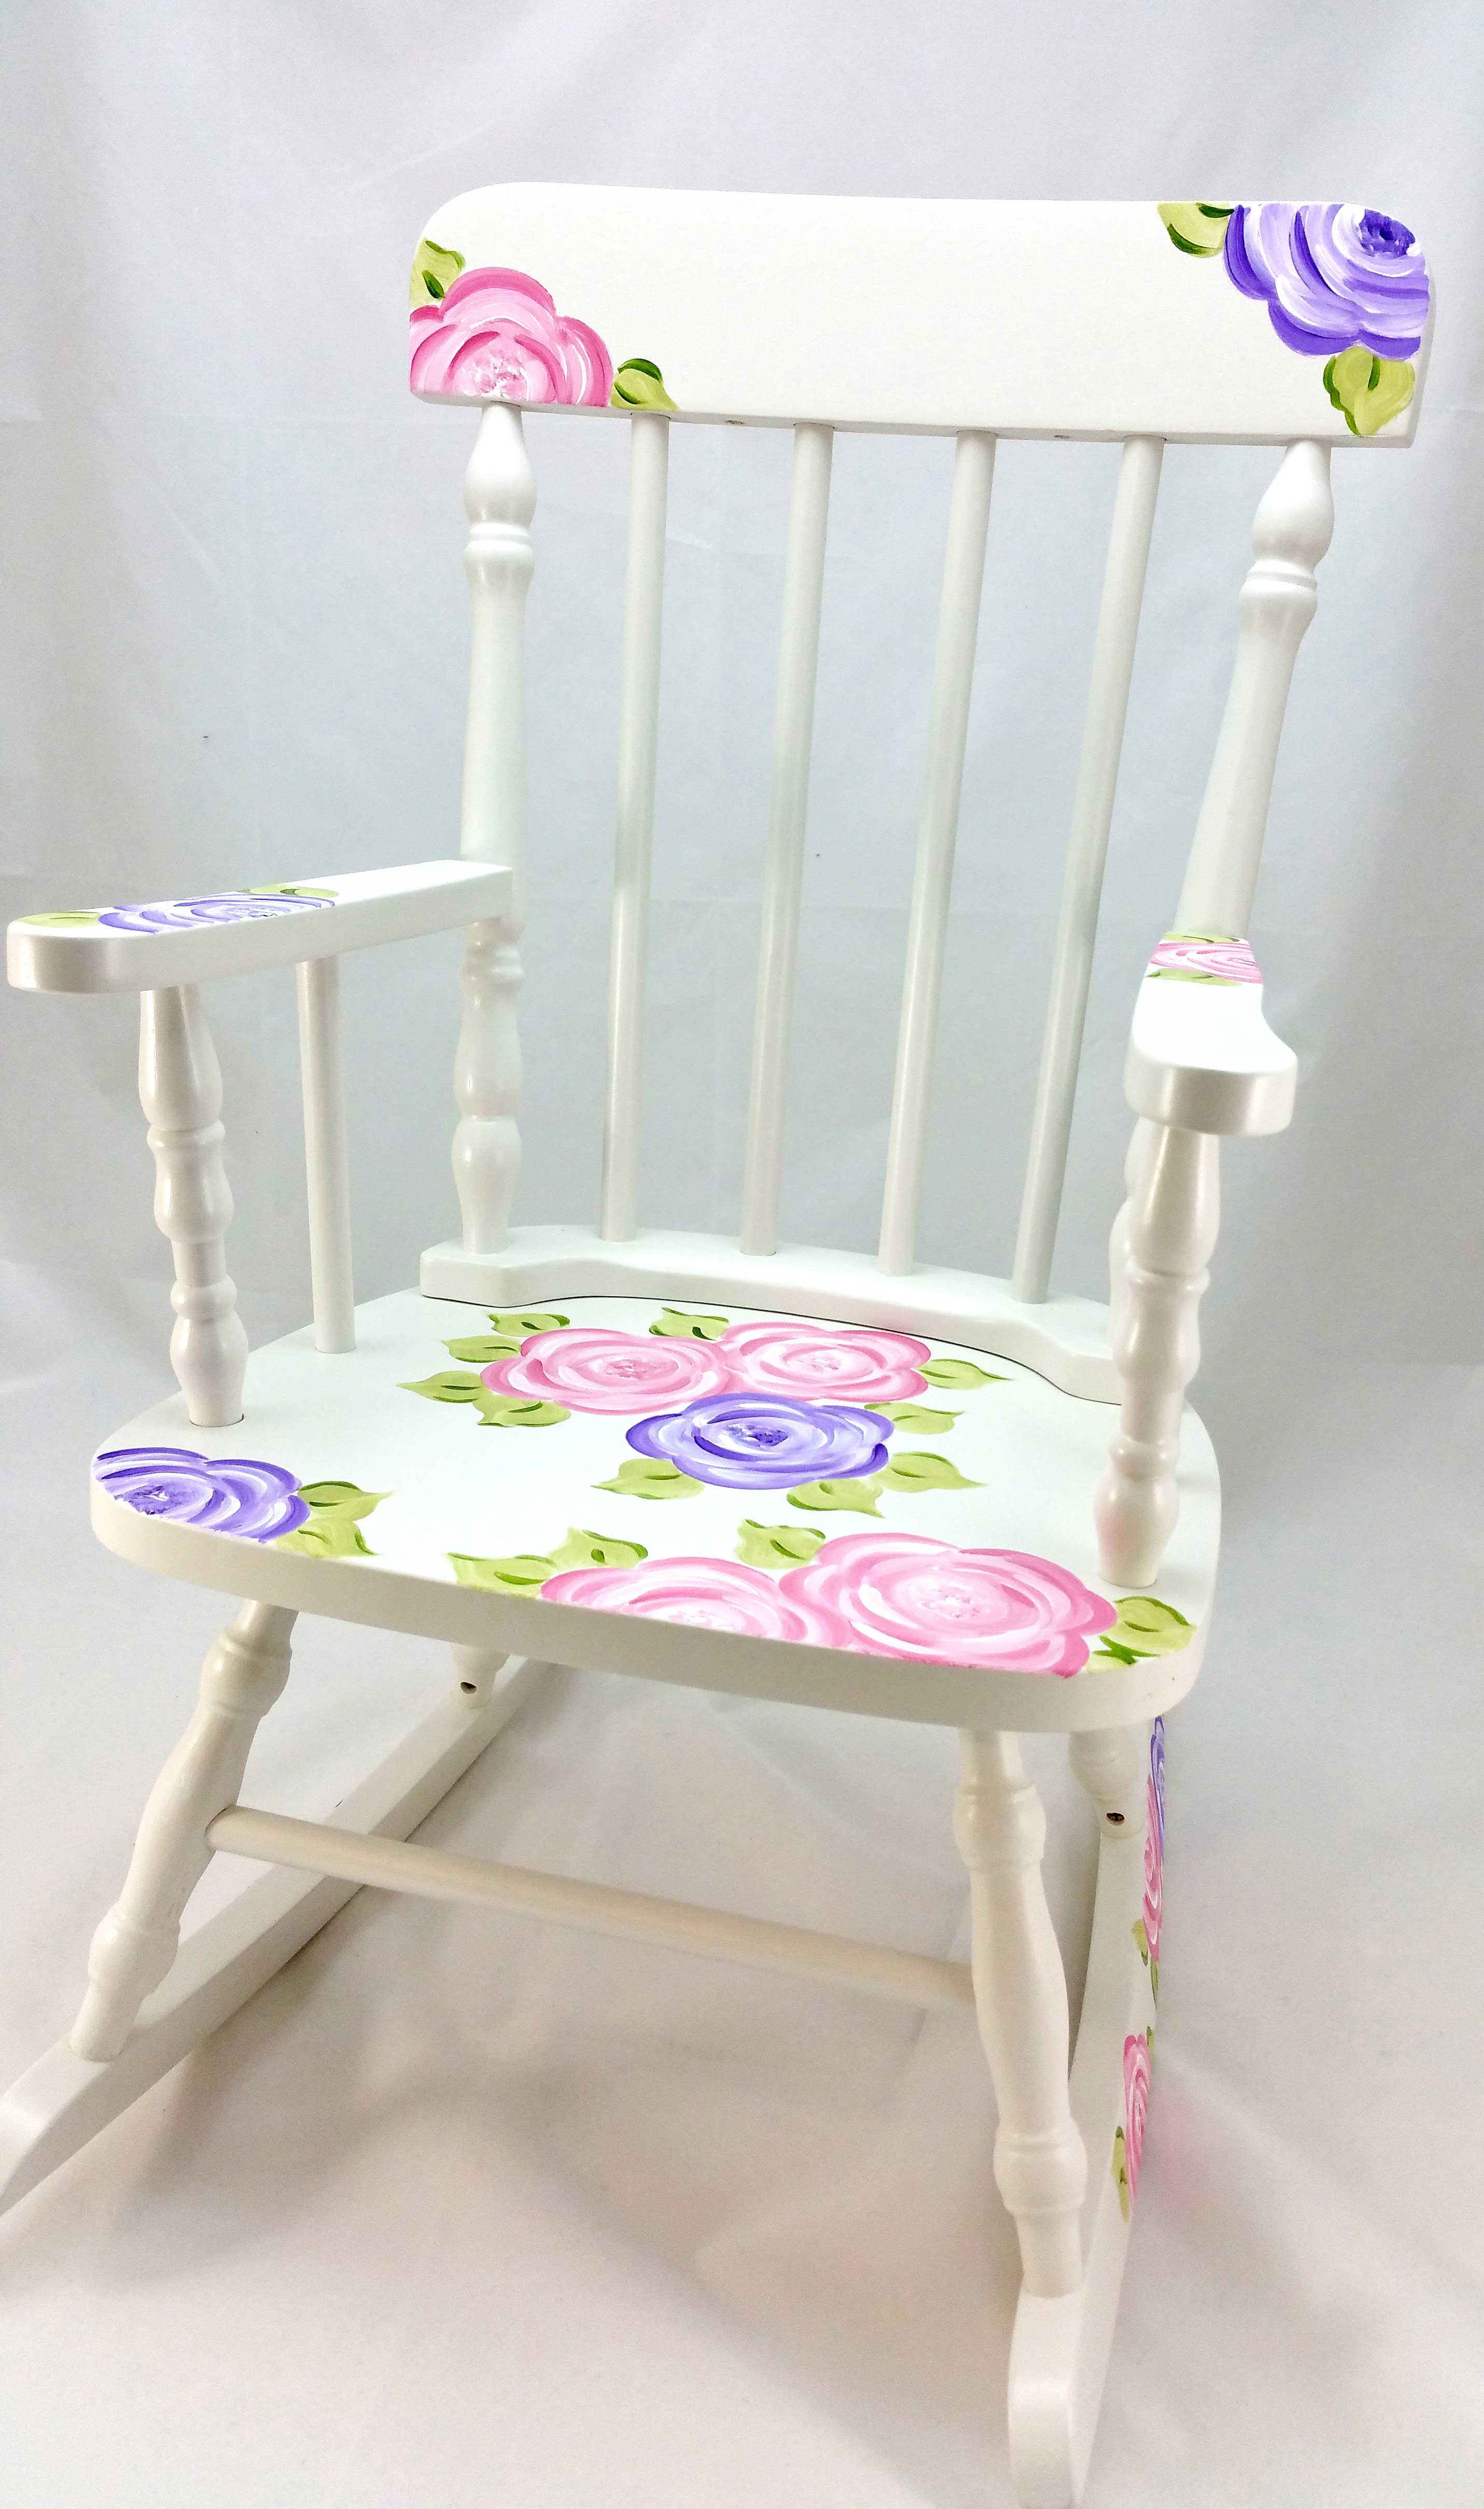 Fantastic Mod Roses Personalized Rocking Chair Purple Pumpkin Gifts Lamtechconsult Wood Chair Design Ideas Lamtechconsultcom